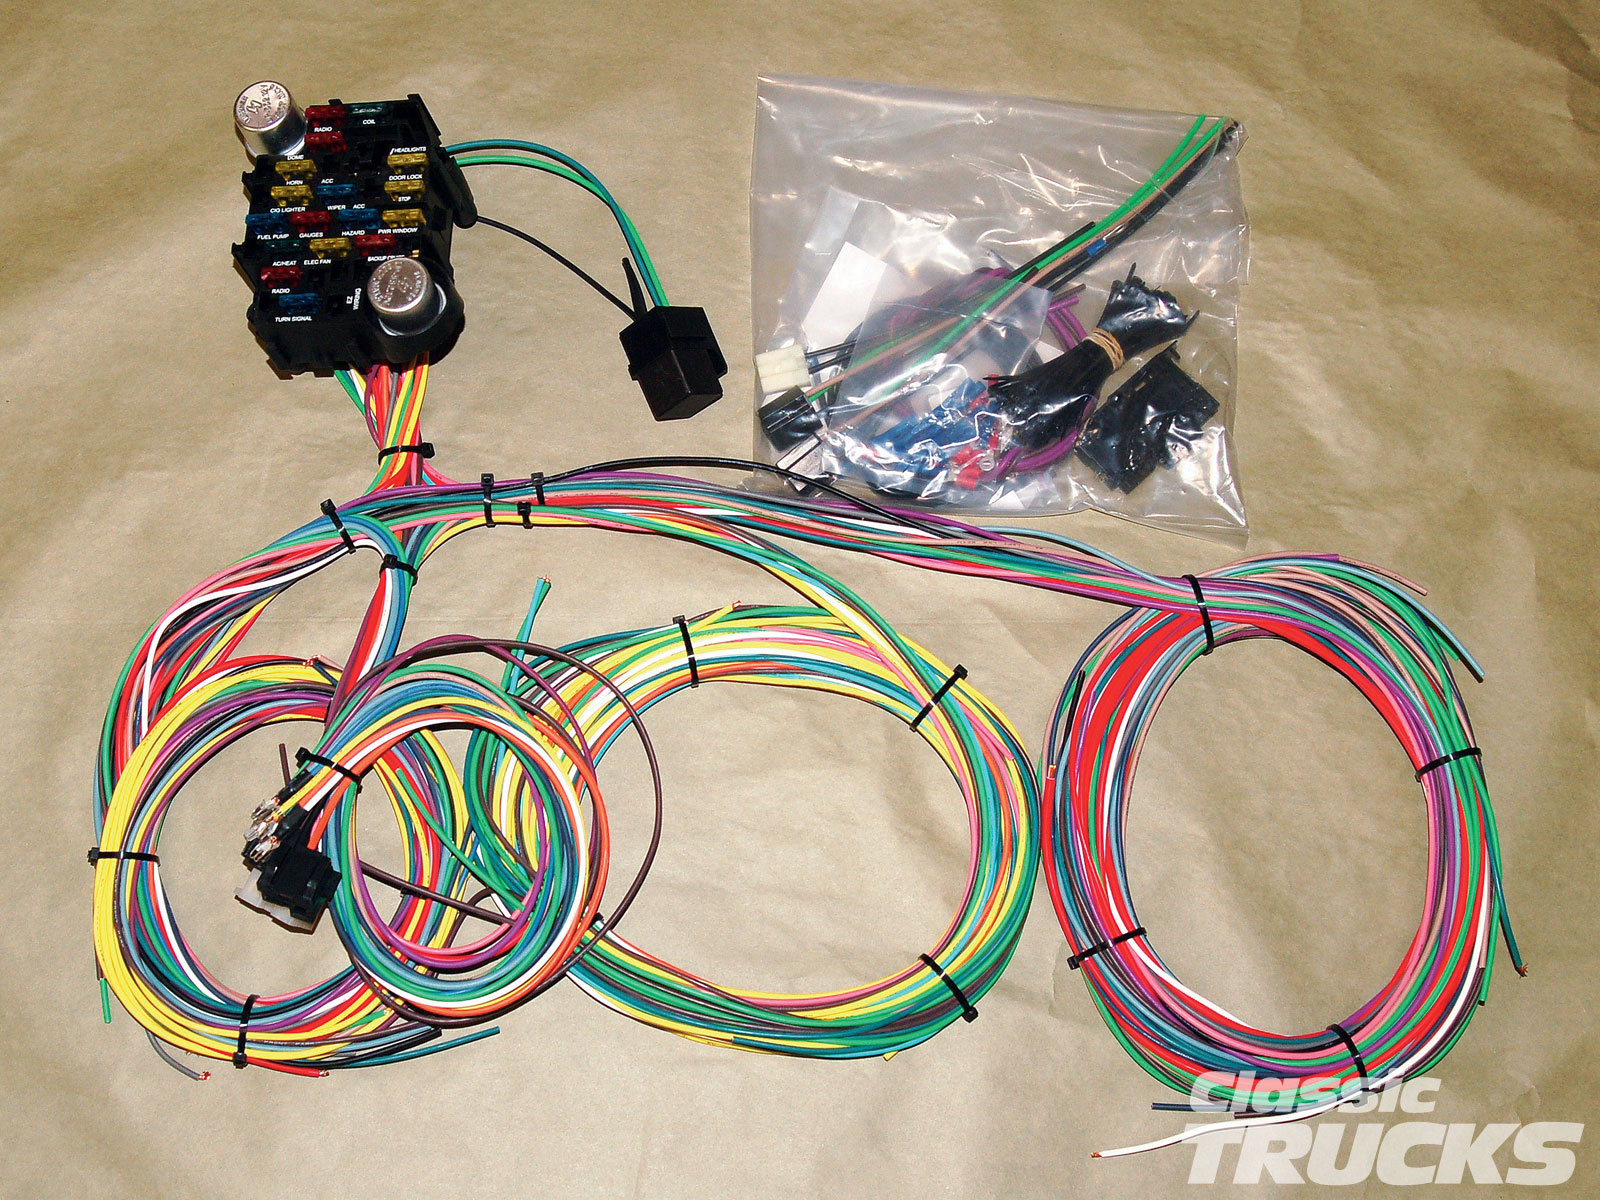 hight resolution of jd 2520 wiring diagram wiring diagram john deere 2520 wiring harness